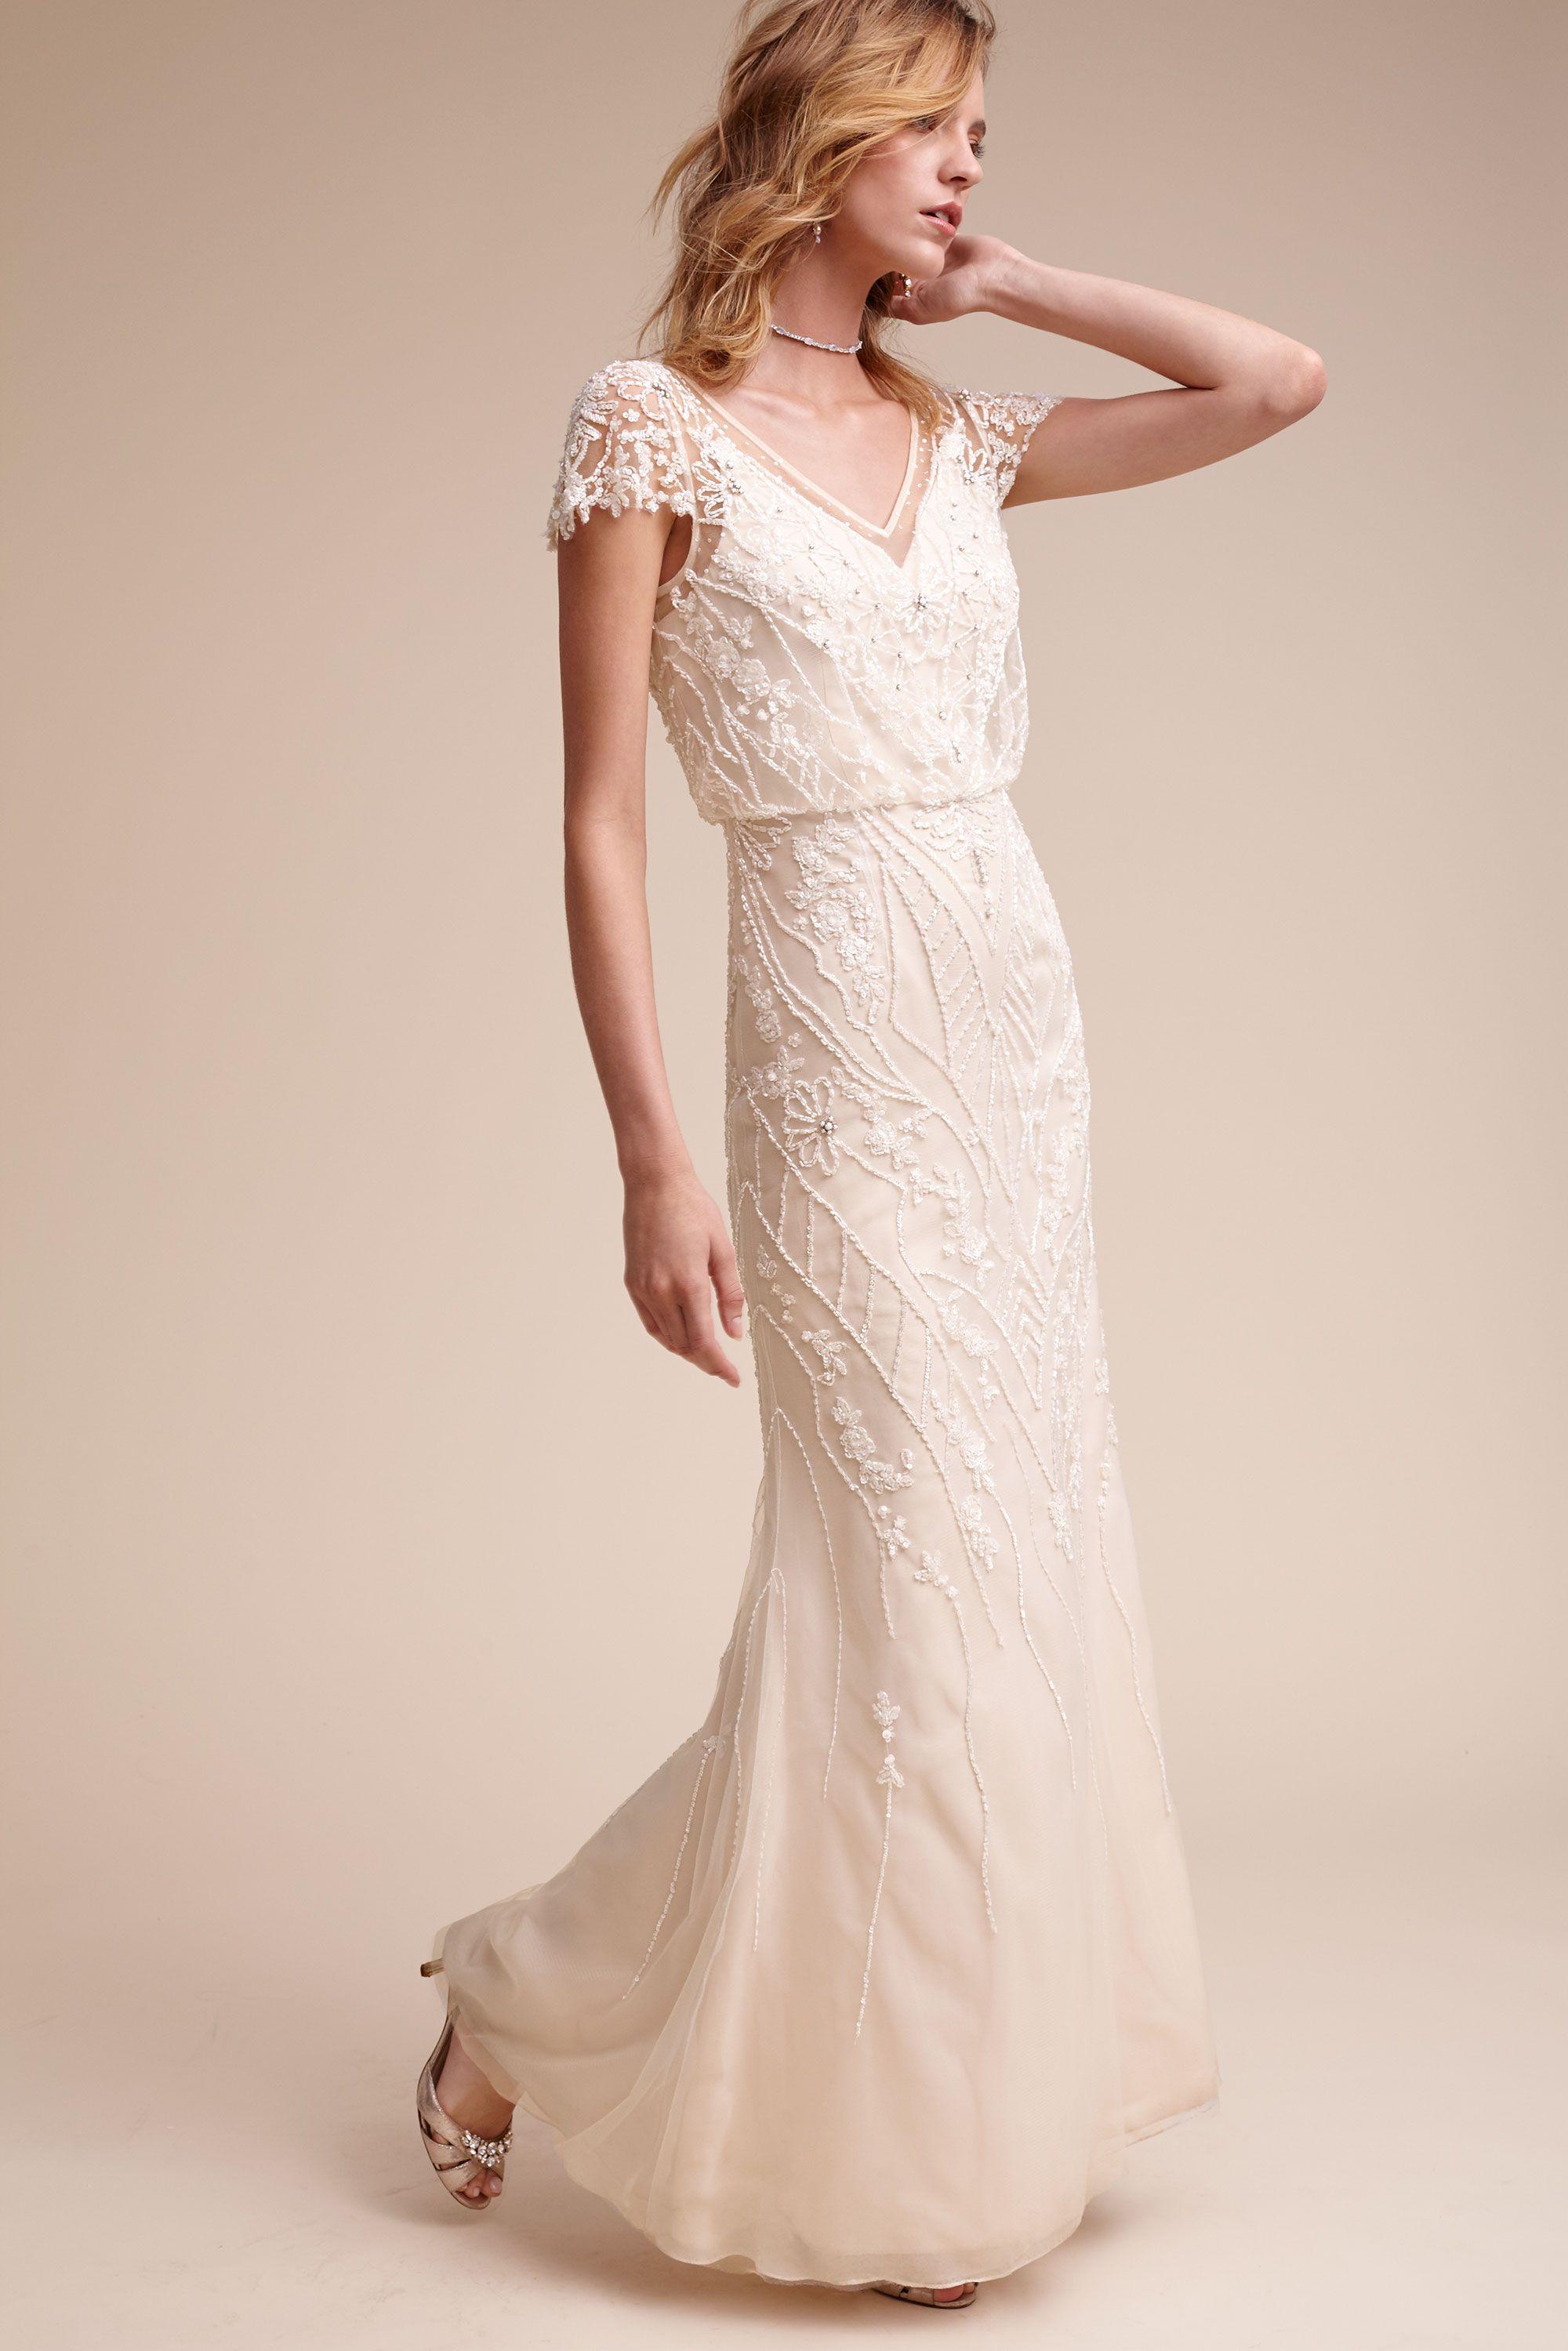 Wedding Vintage Wedding Dresses wedding dresses vintage simple gowns bhldn aurora gown gown